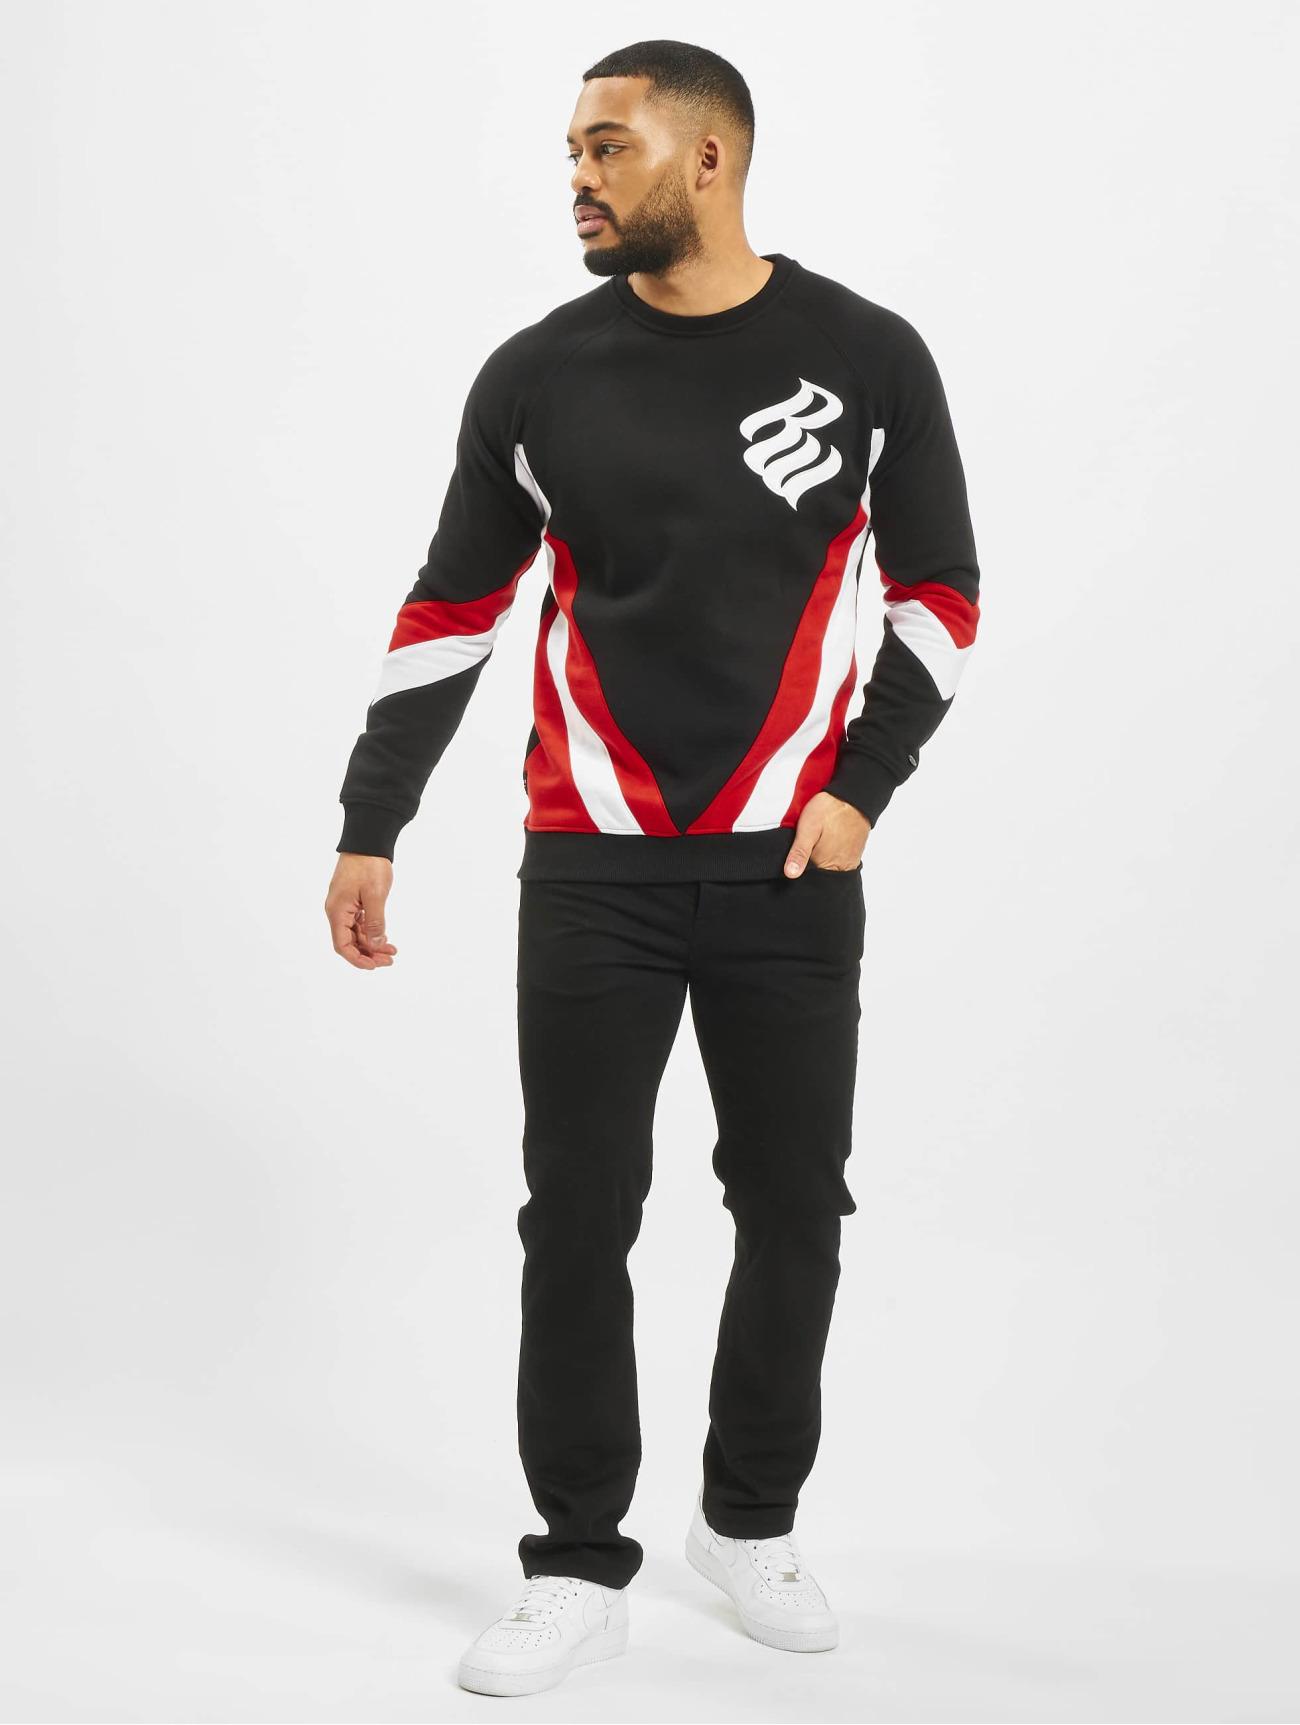 Rocawear Overwear / Jumper Albion in black 647625